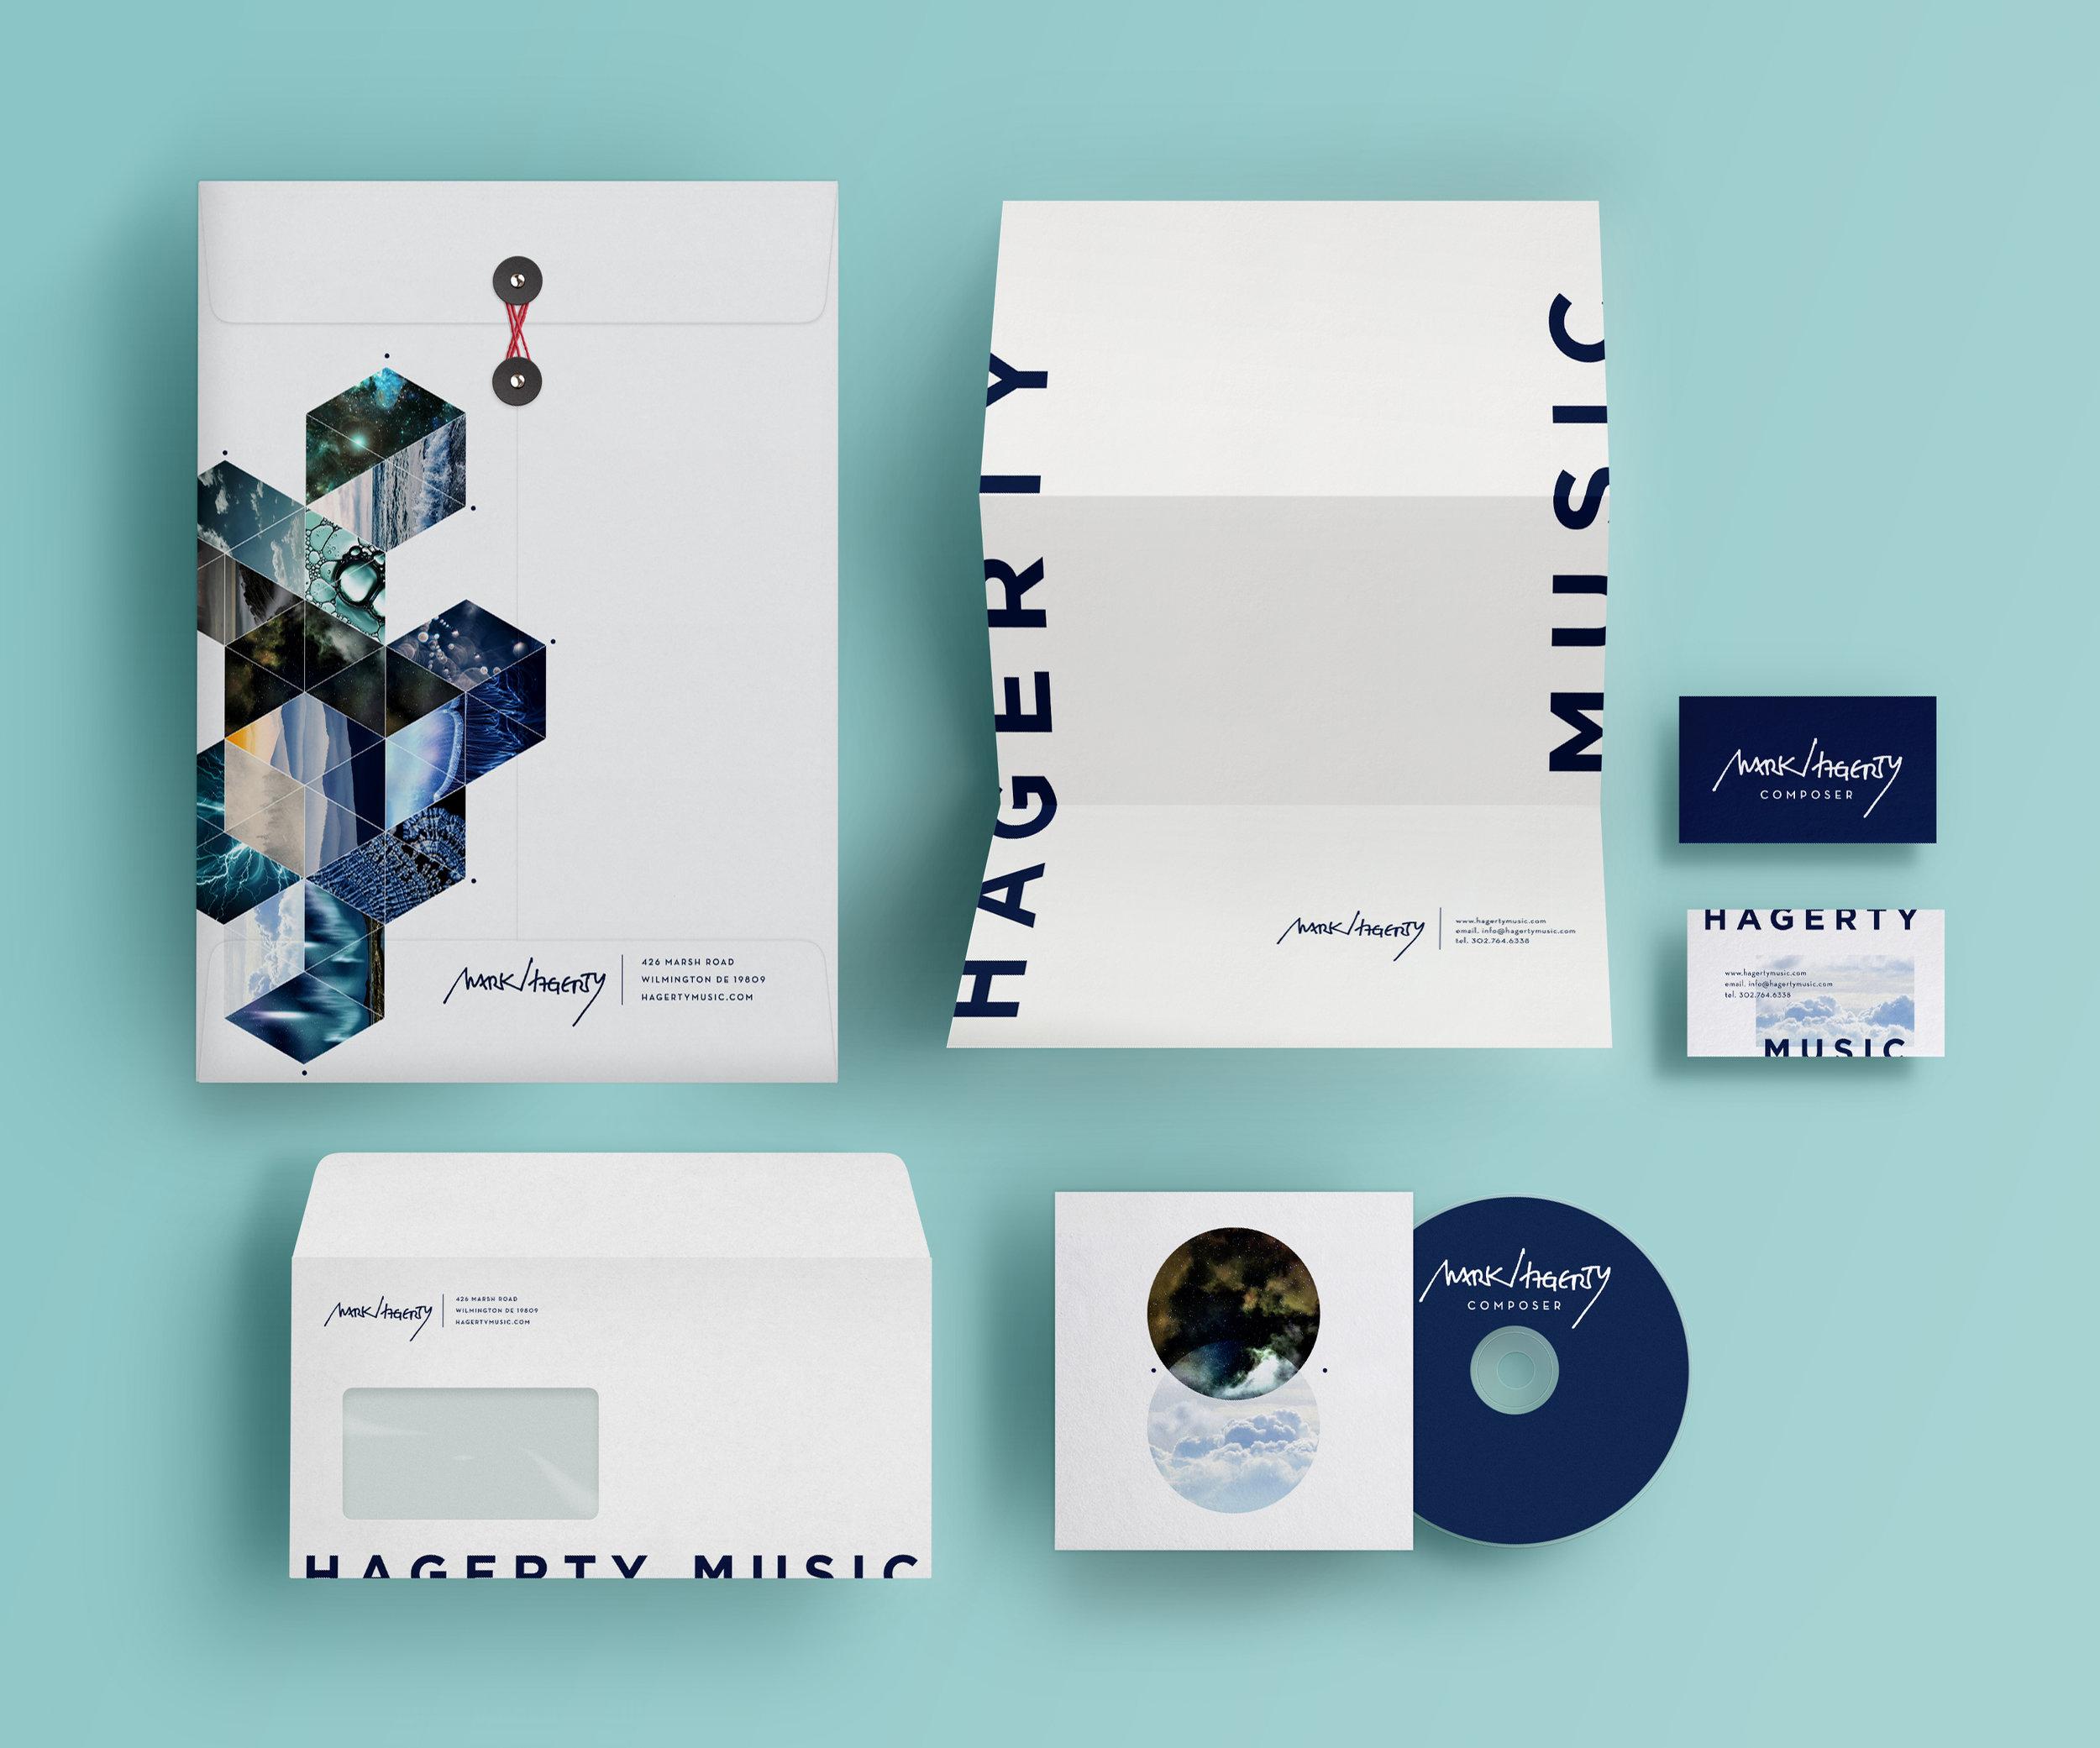 Mark-Hagerty-Music-Composer-Visual-Brand-Identity-Design-Delaware.jpg